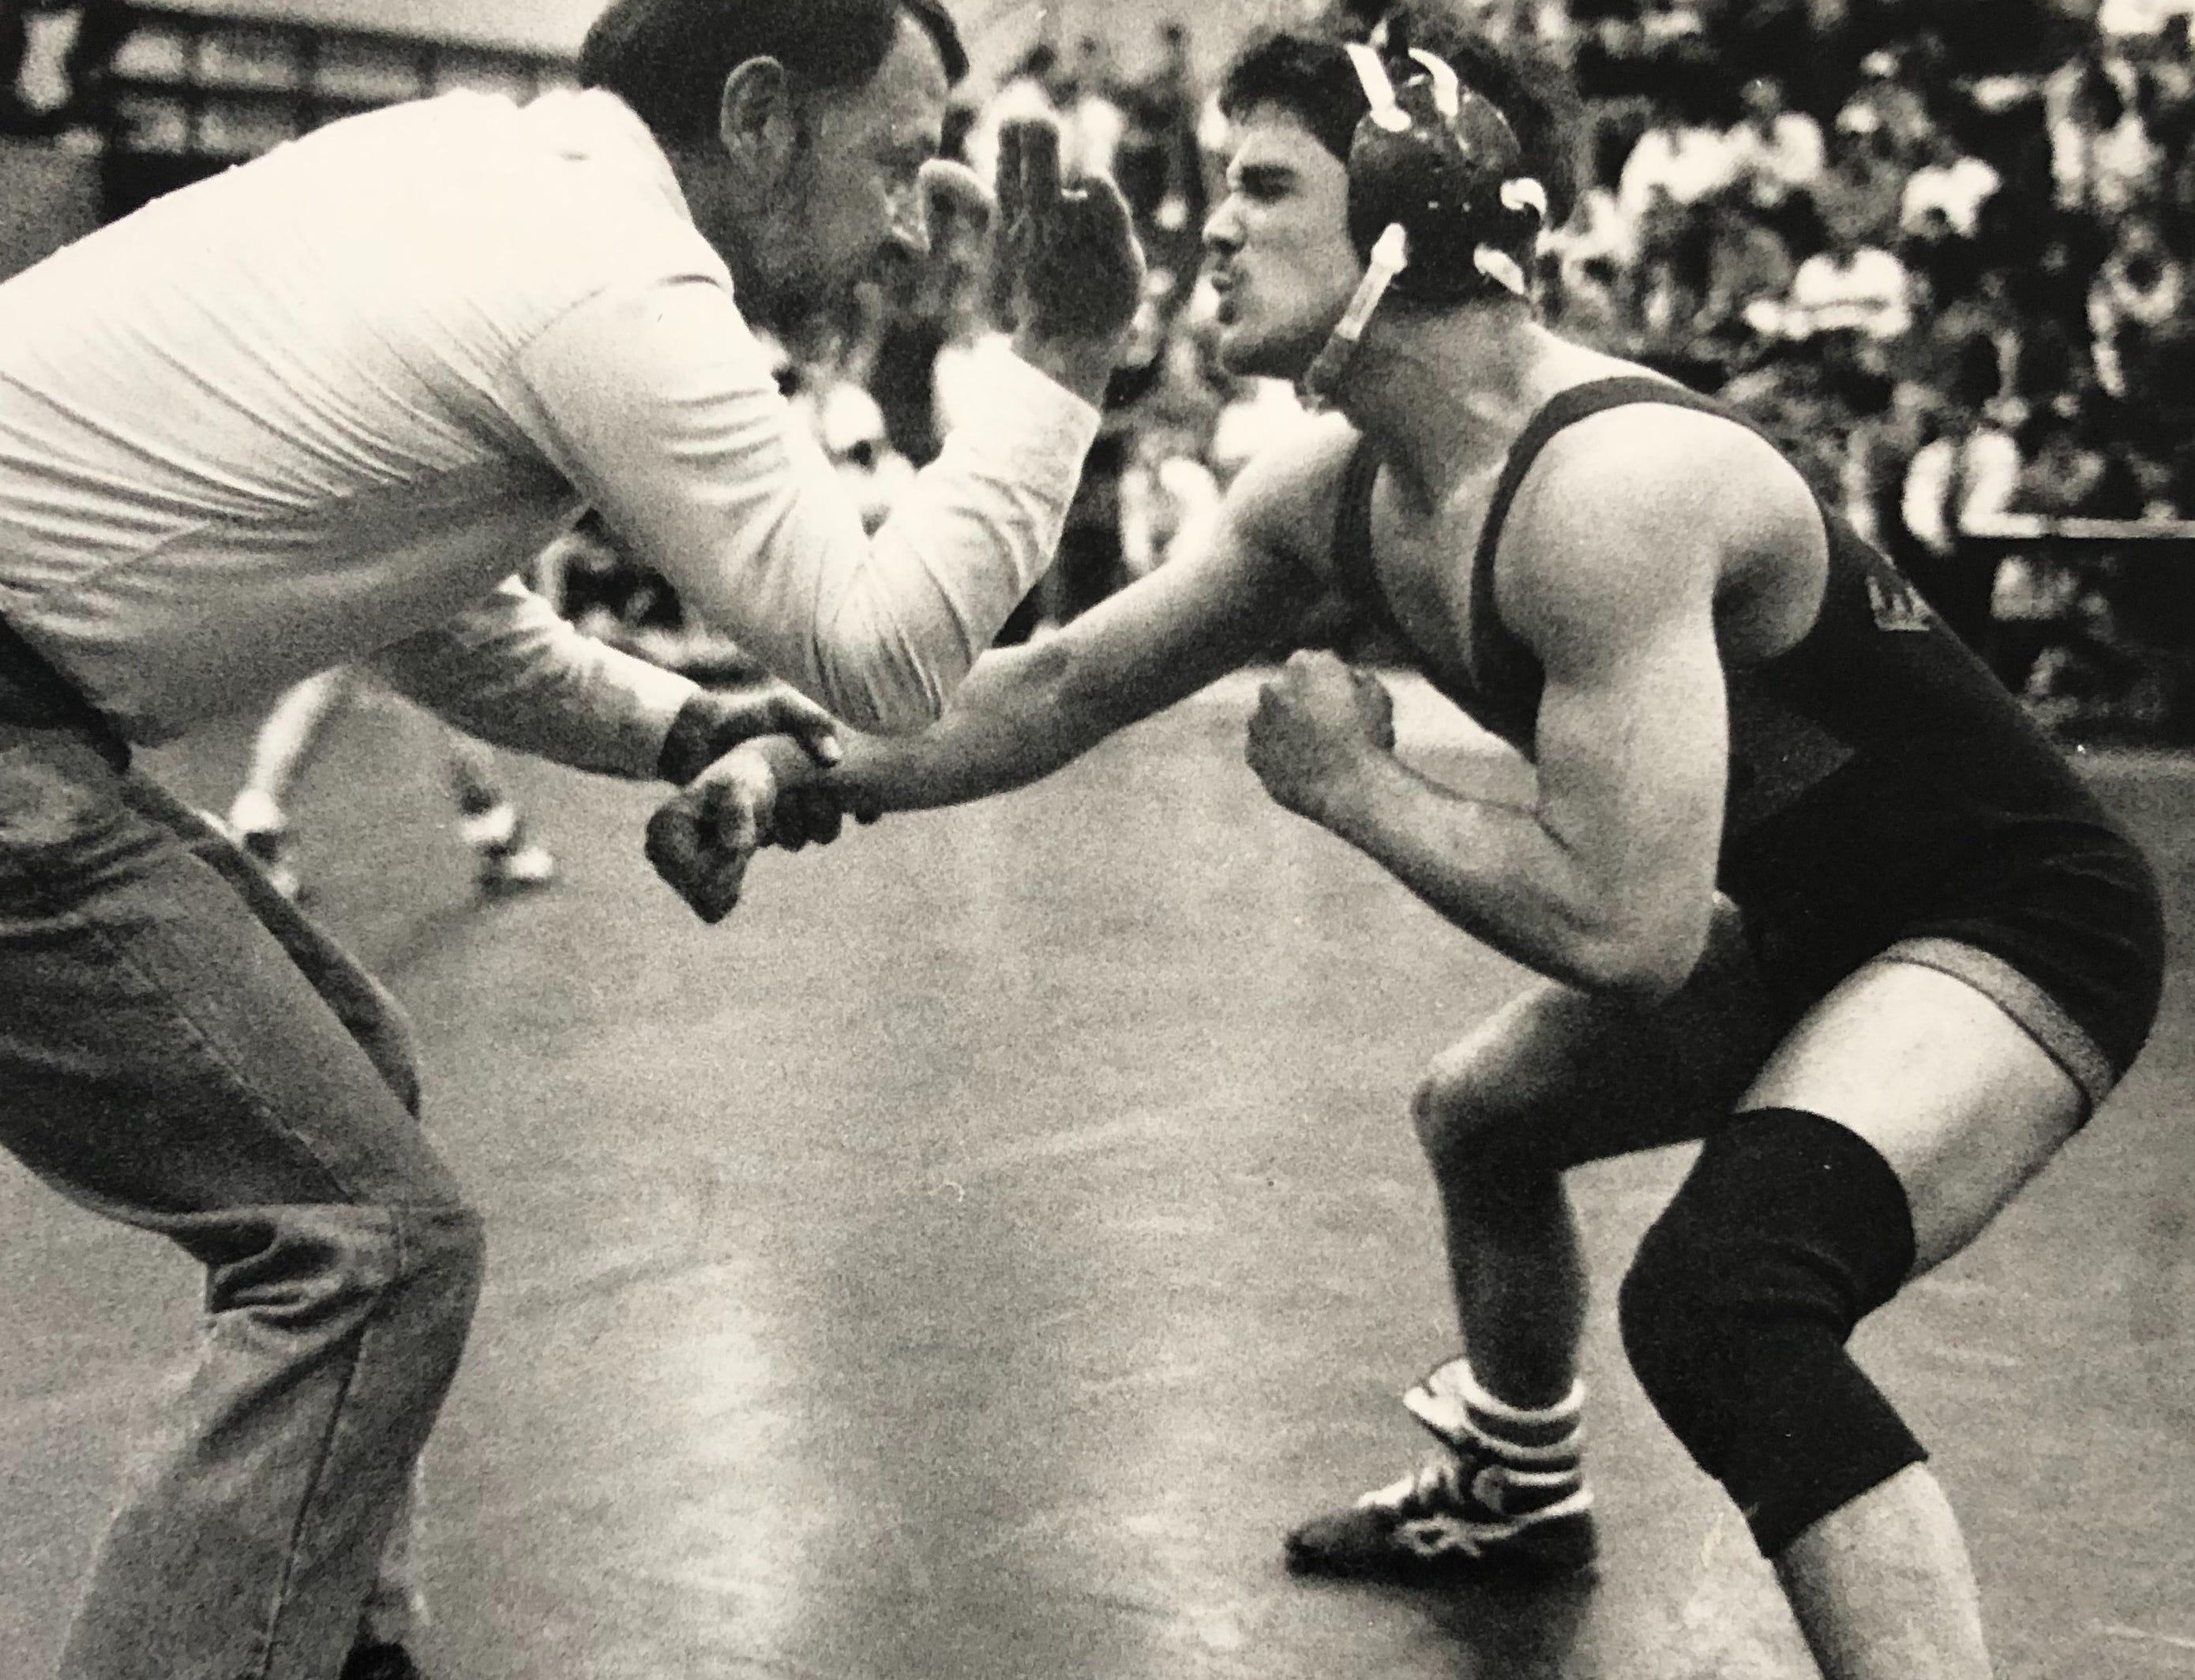 Joe Duhigg